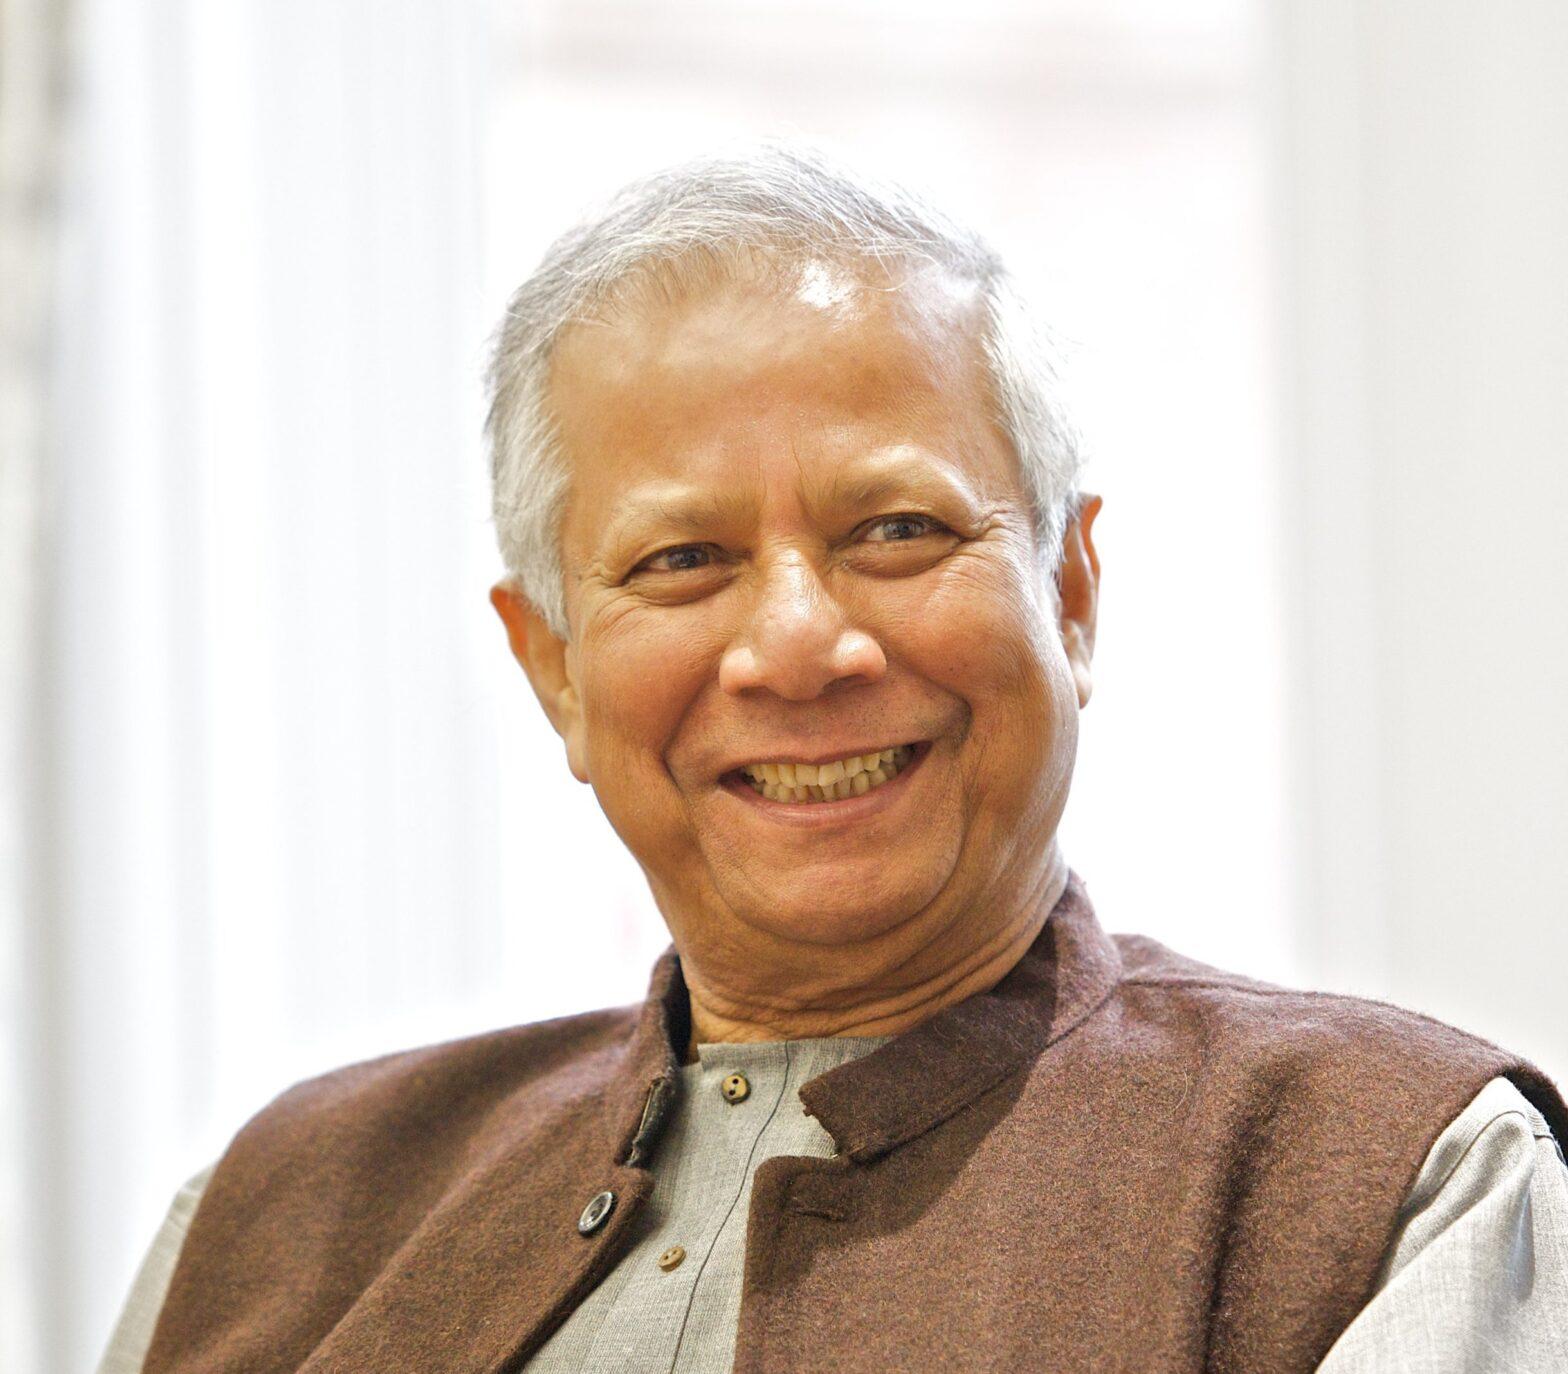 CWEIC Leadership Series: A Conversation with Muhammad Yunus